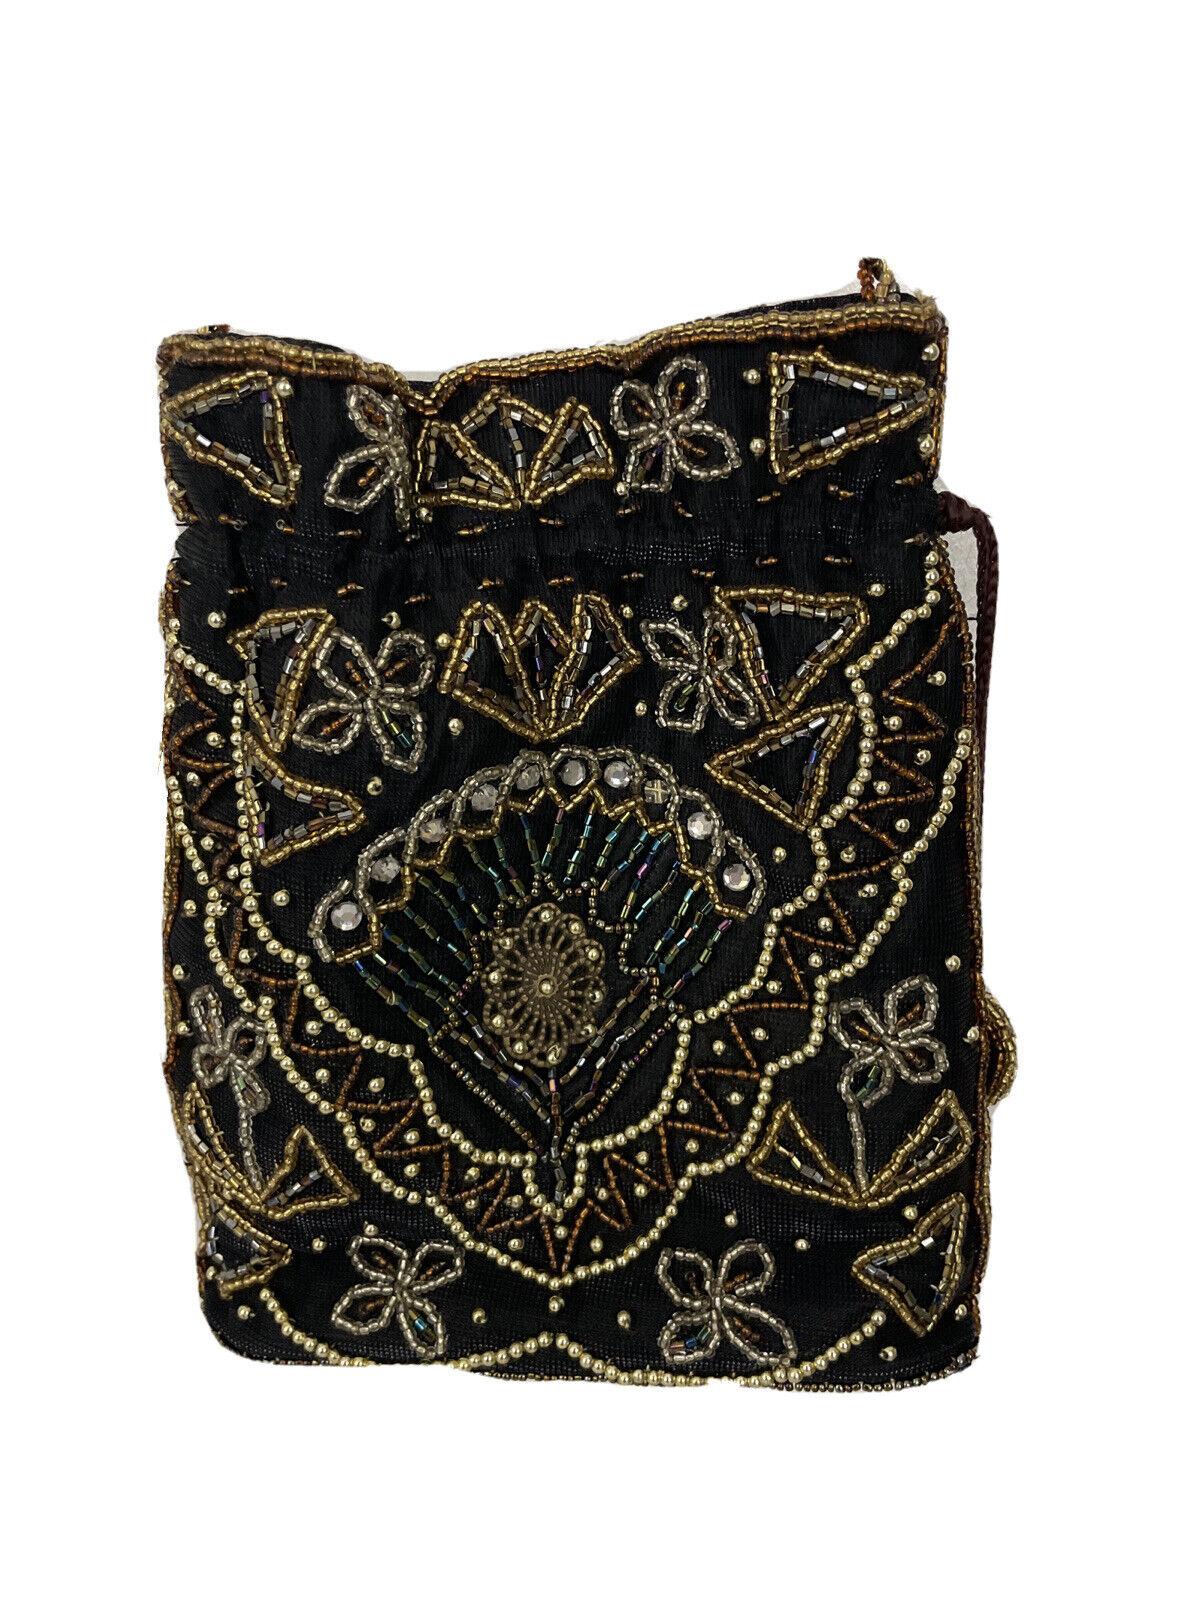 Womens Black Gold Silver Cooper Beaded Evening Drawstring Handbag Shoulder Bag